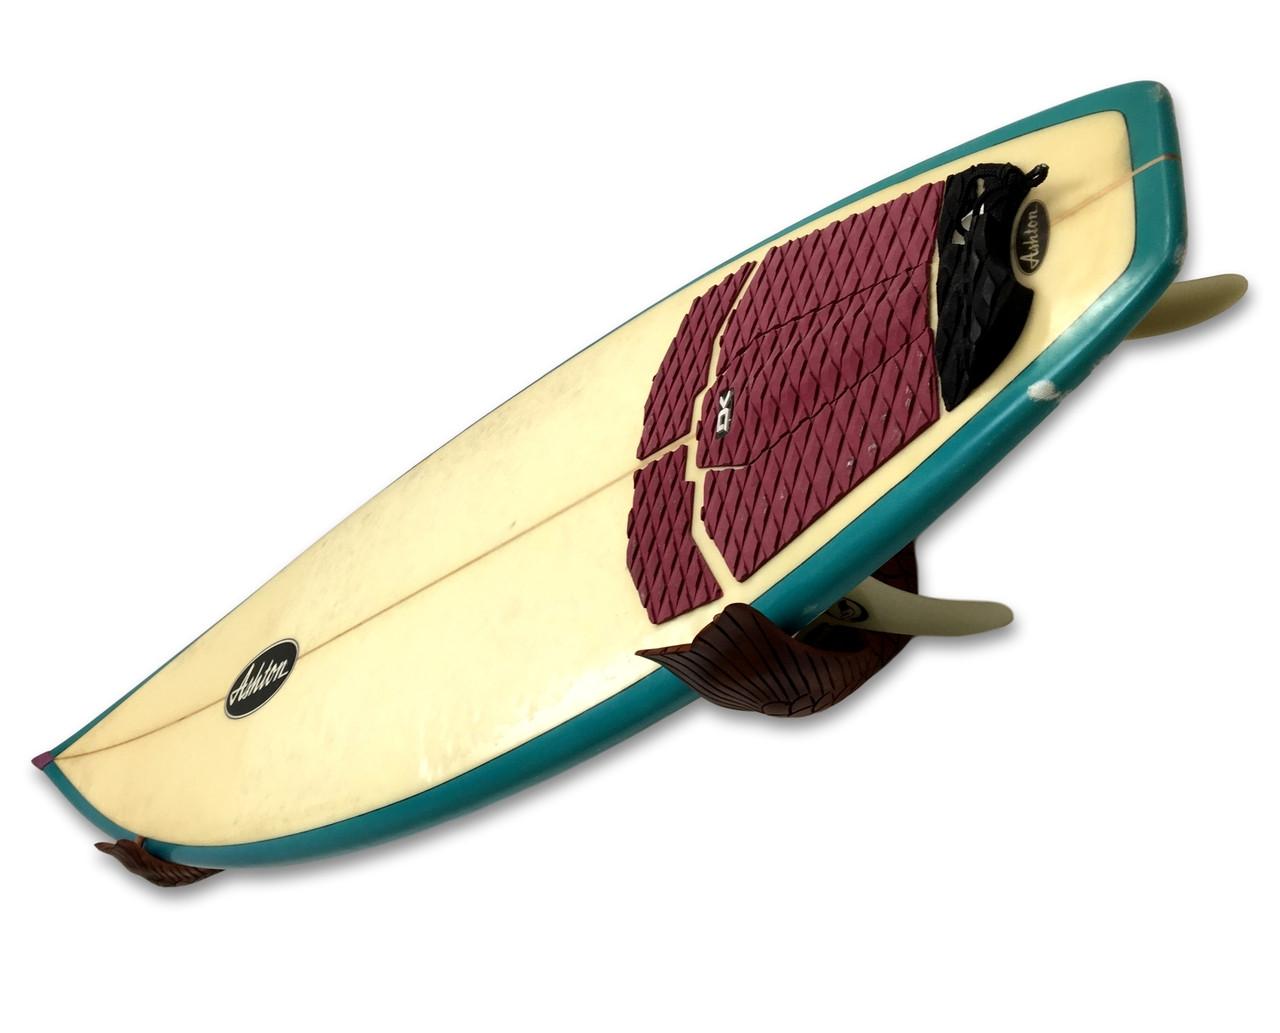 Handcrafted Wood Mermaid Tail   Surfboard Wall Display Rack ...